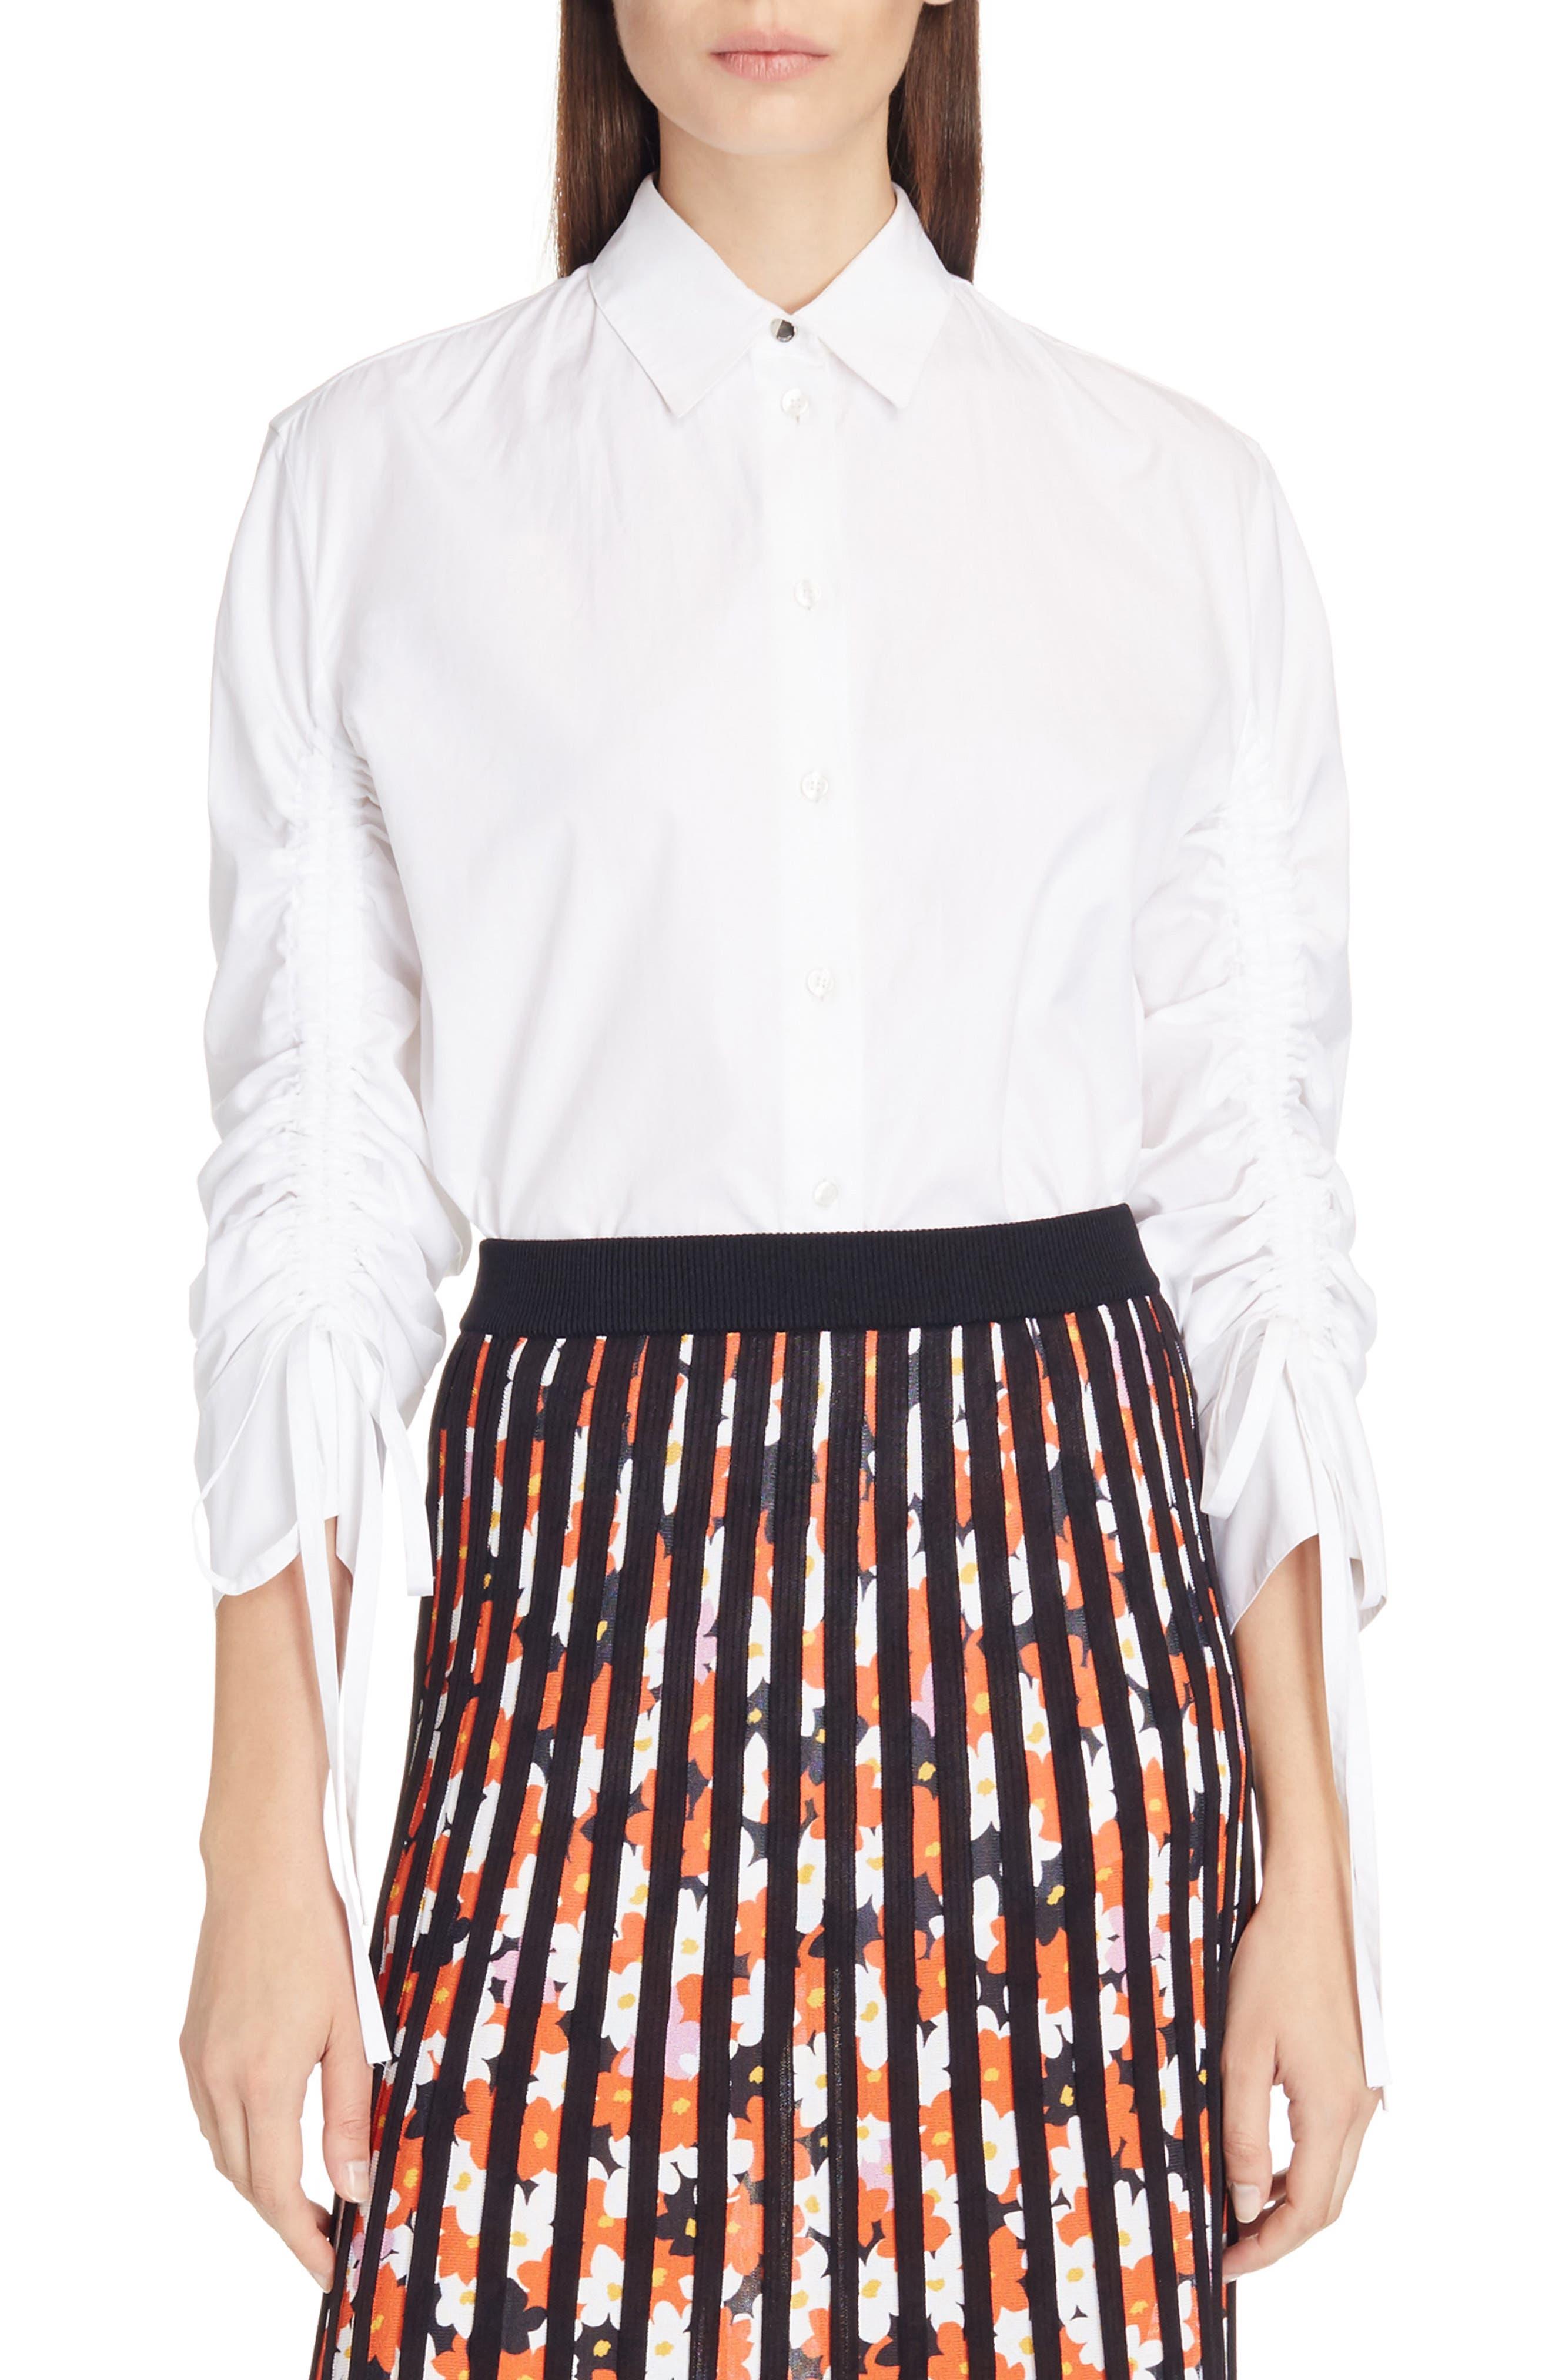 Drawstring Blouse,                         Main,                         color, White